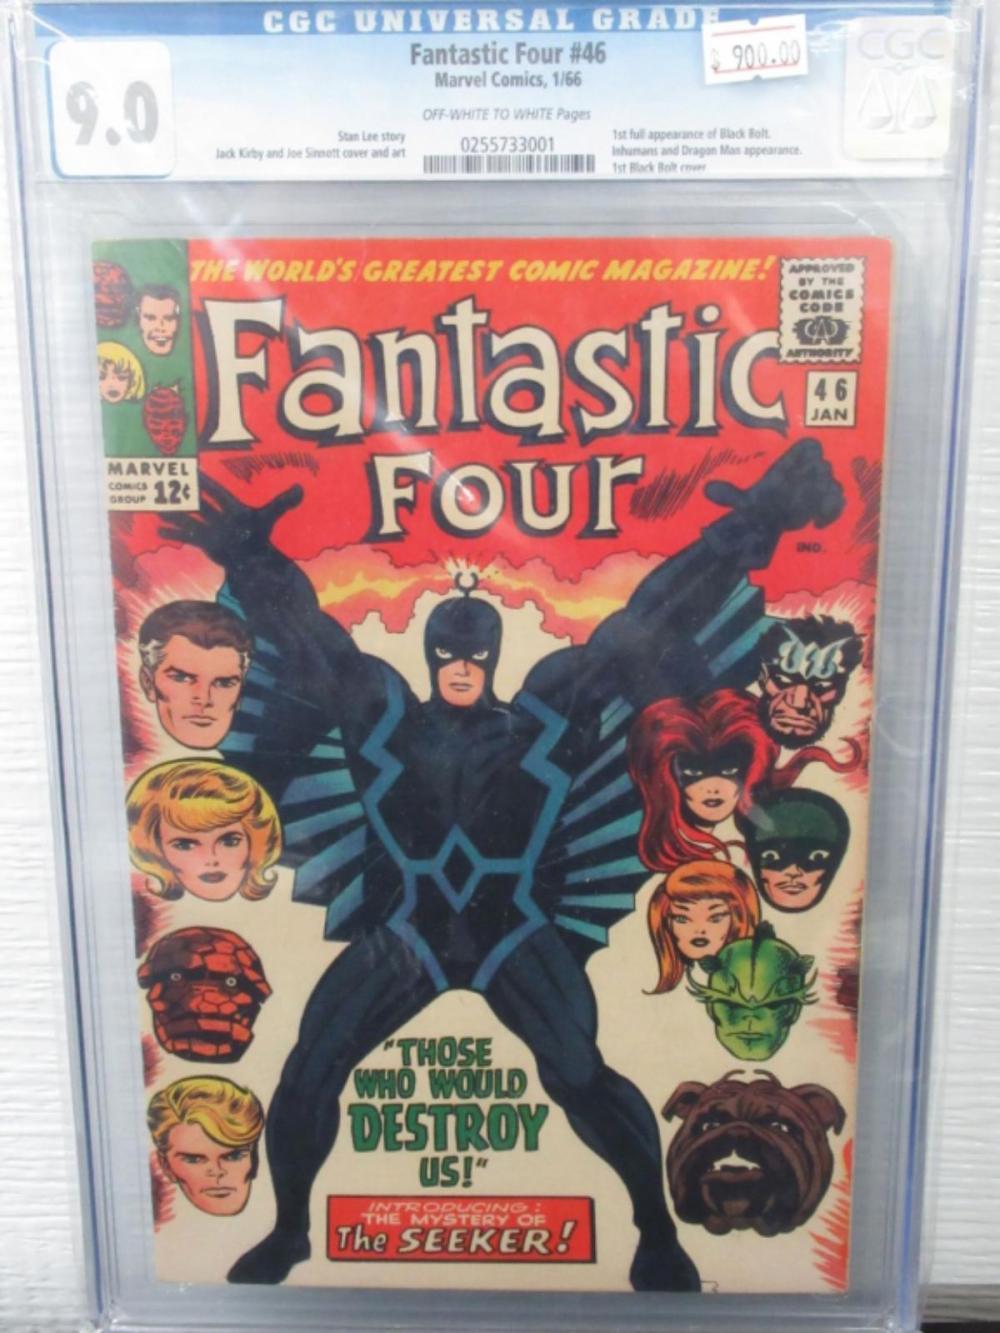 Lot 59: Fantastic Four #46 CGC 9.0 1st full Black Bolt